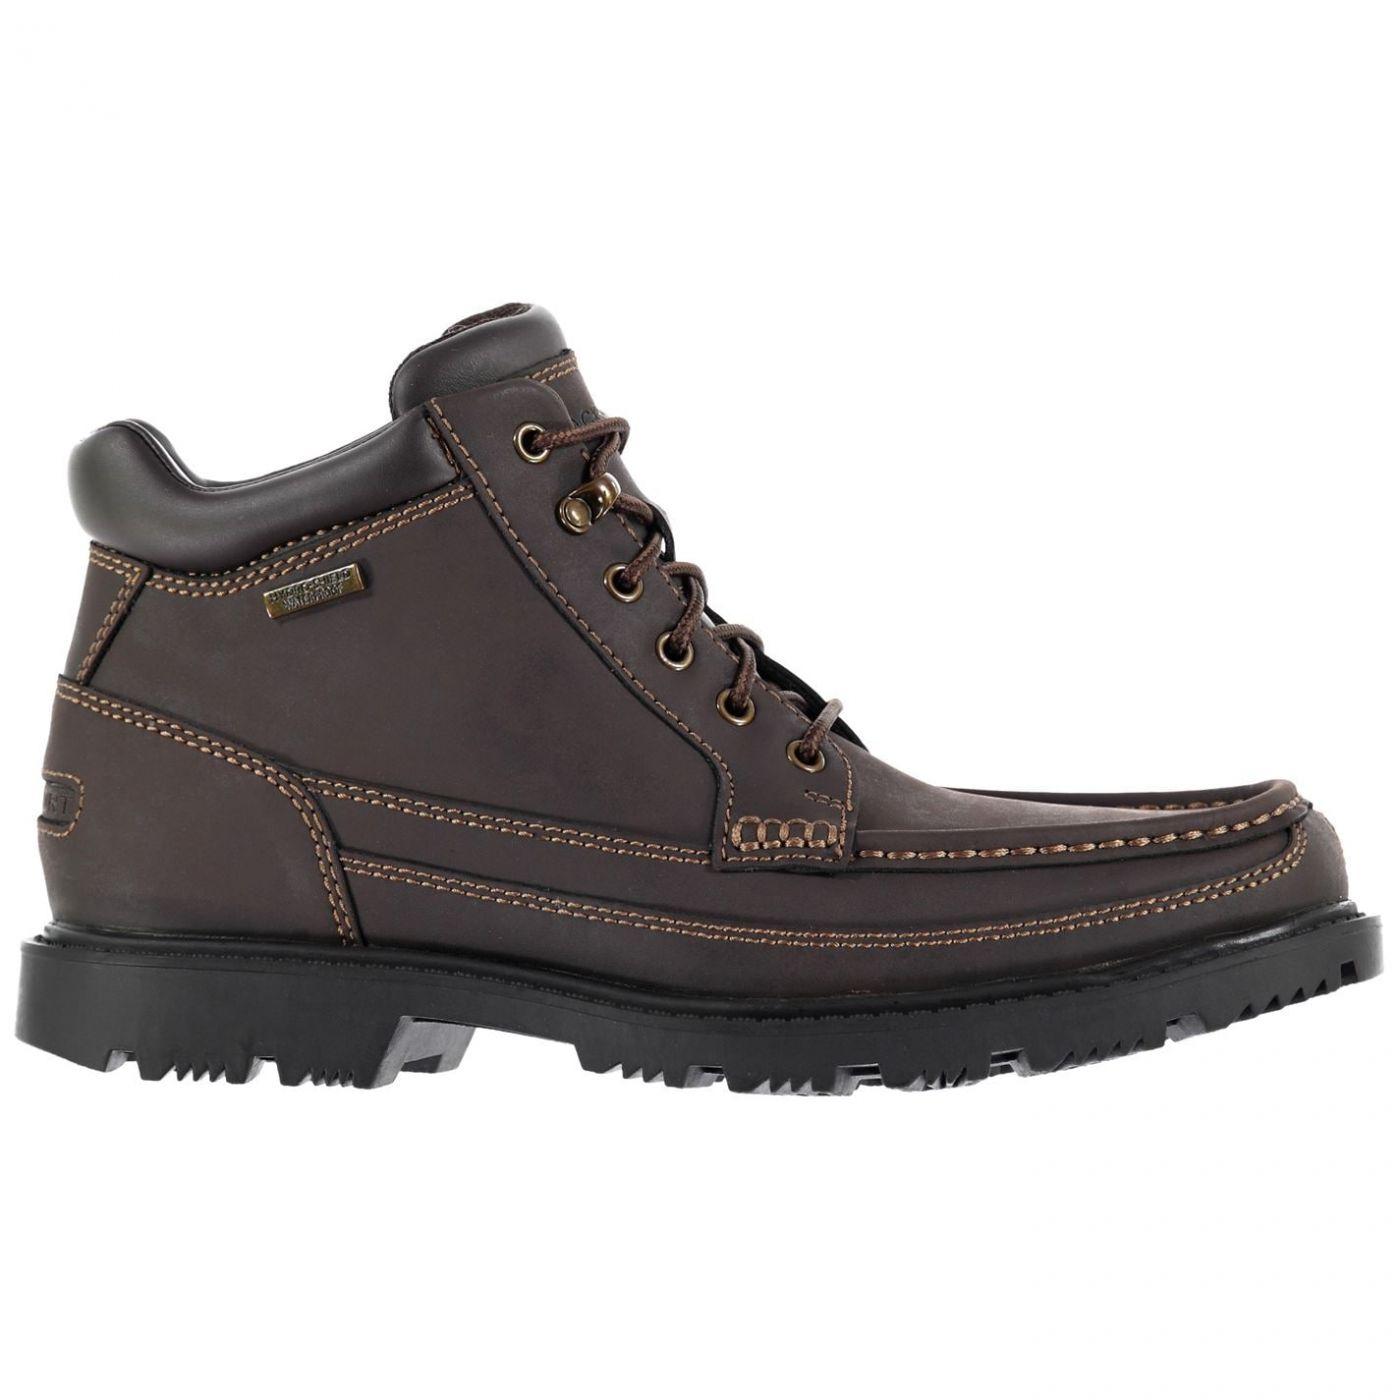 Rockport Moc boot Sn01